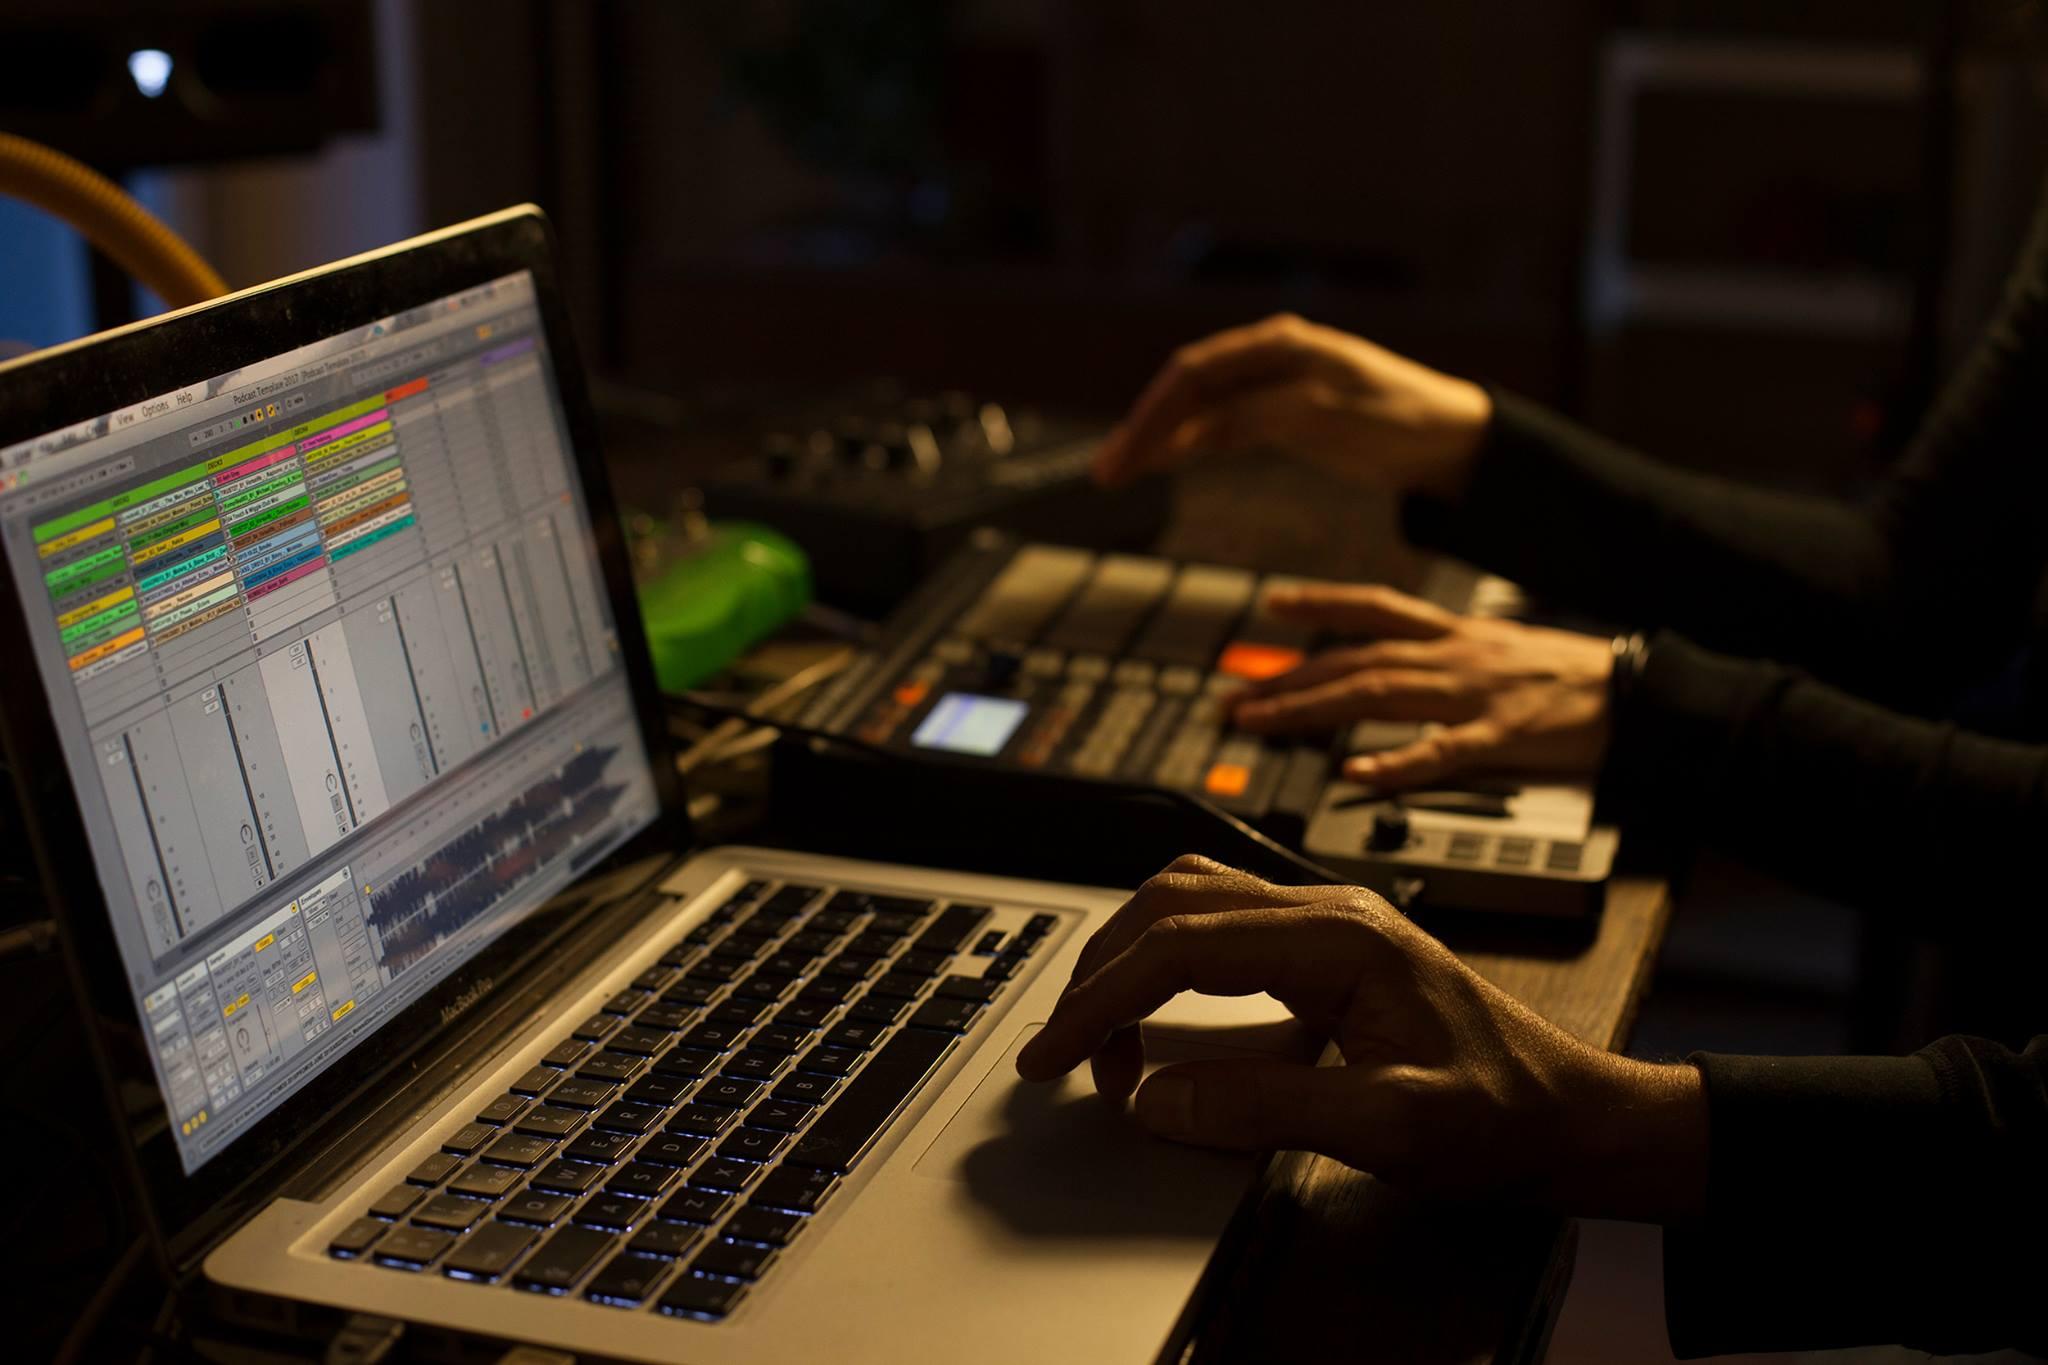 Refuge Worldwide is partnering with Open Music Lab Berlin